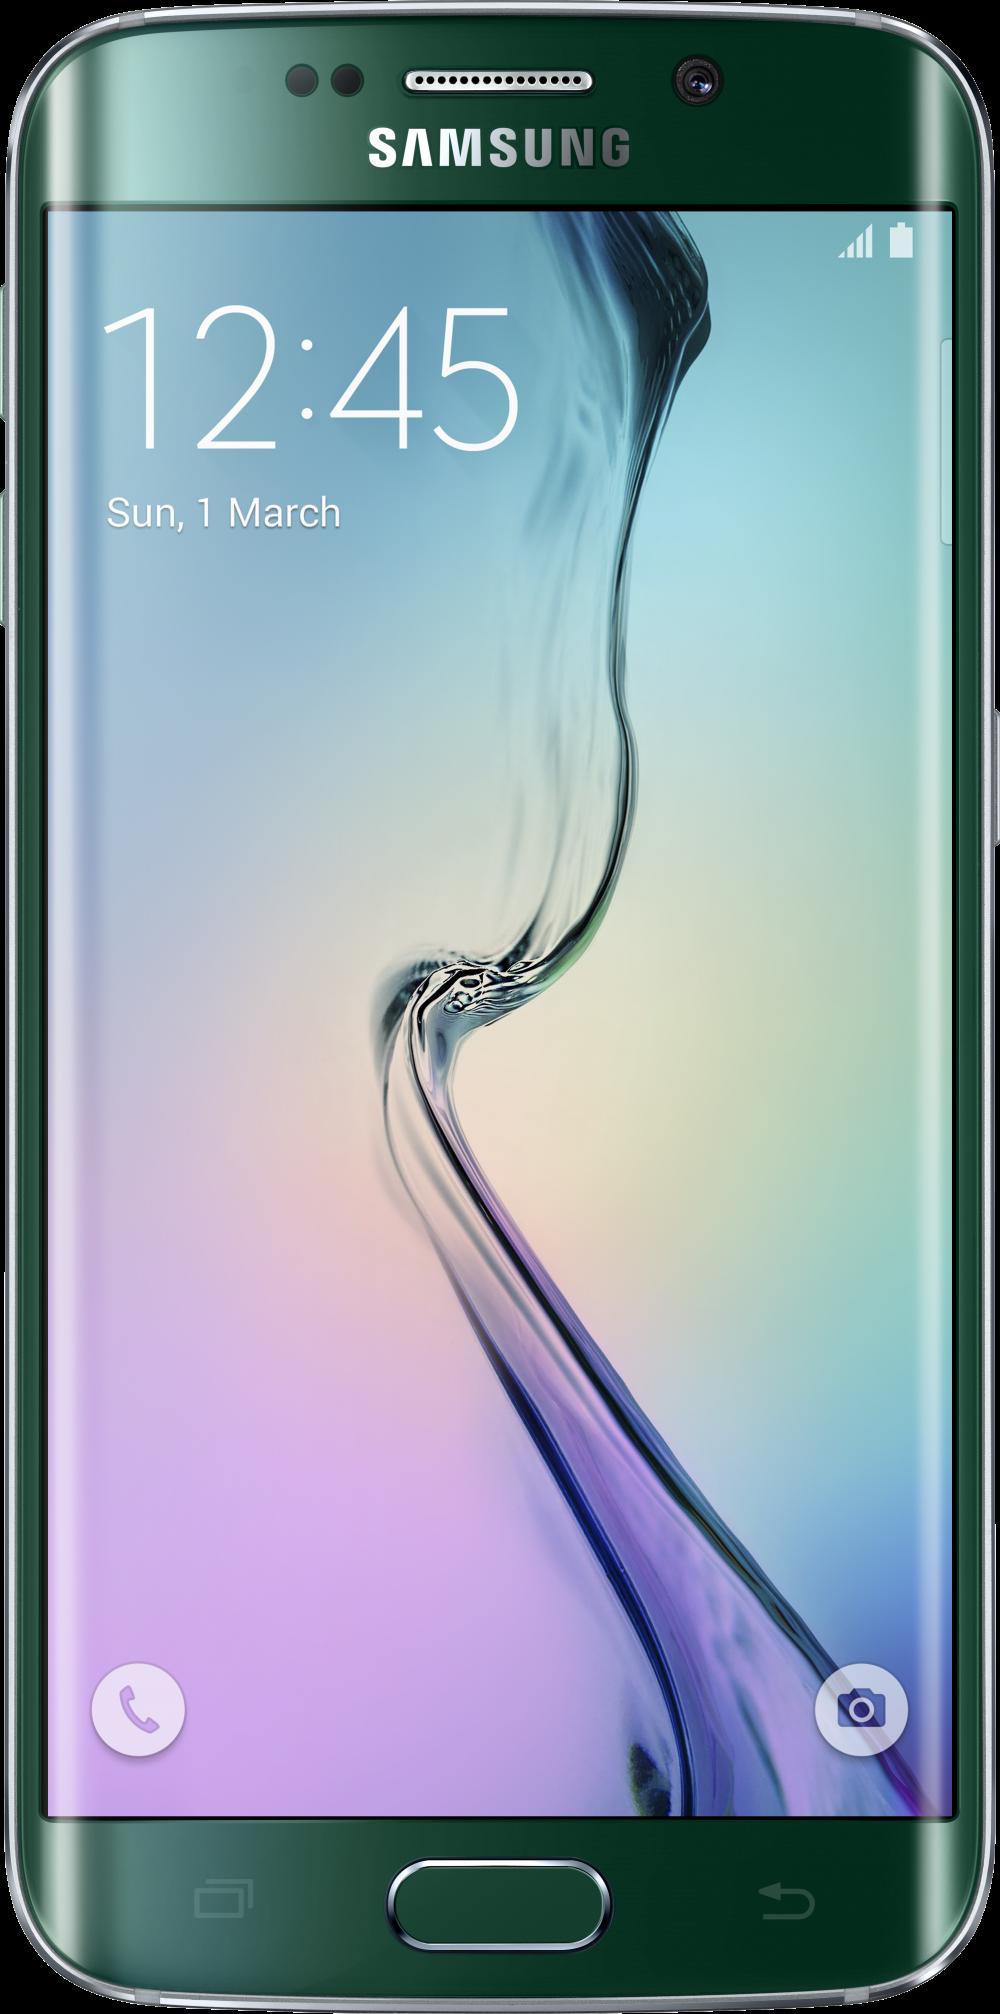 Samsung Galaxy S6 edge 32 GB Công ty | CellphoneS.com.vn-2